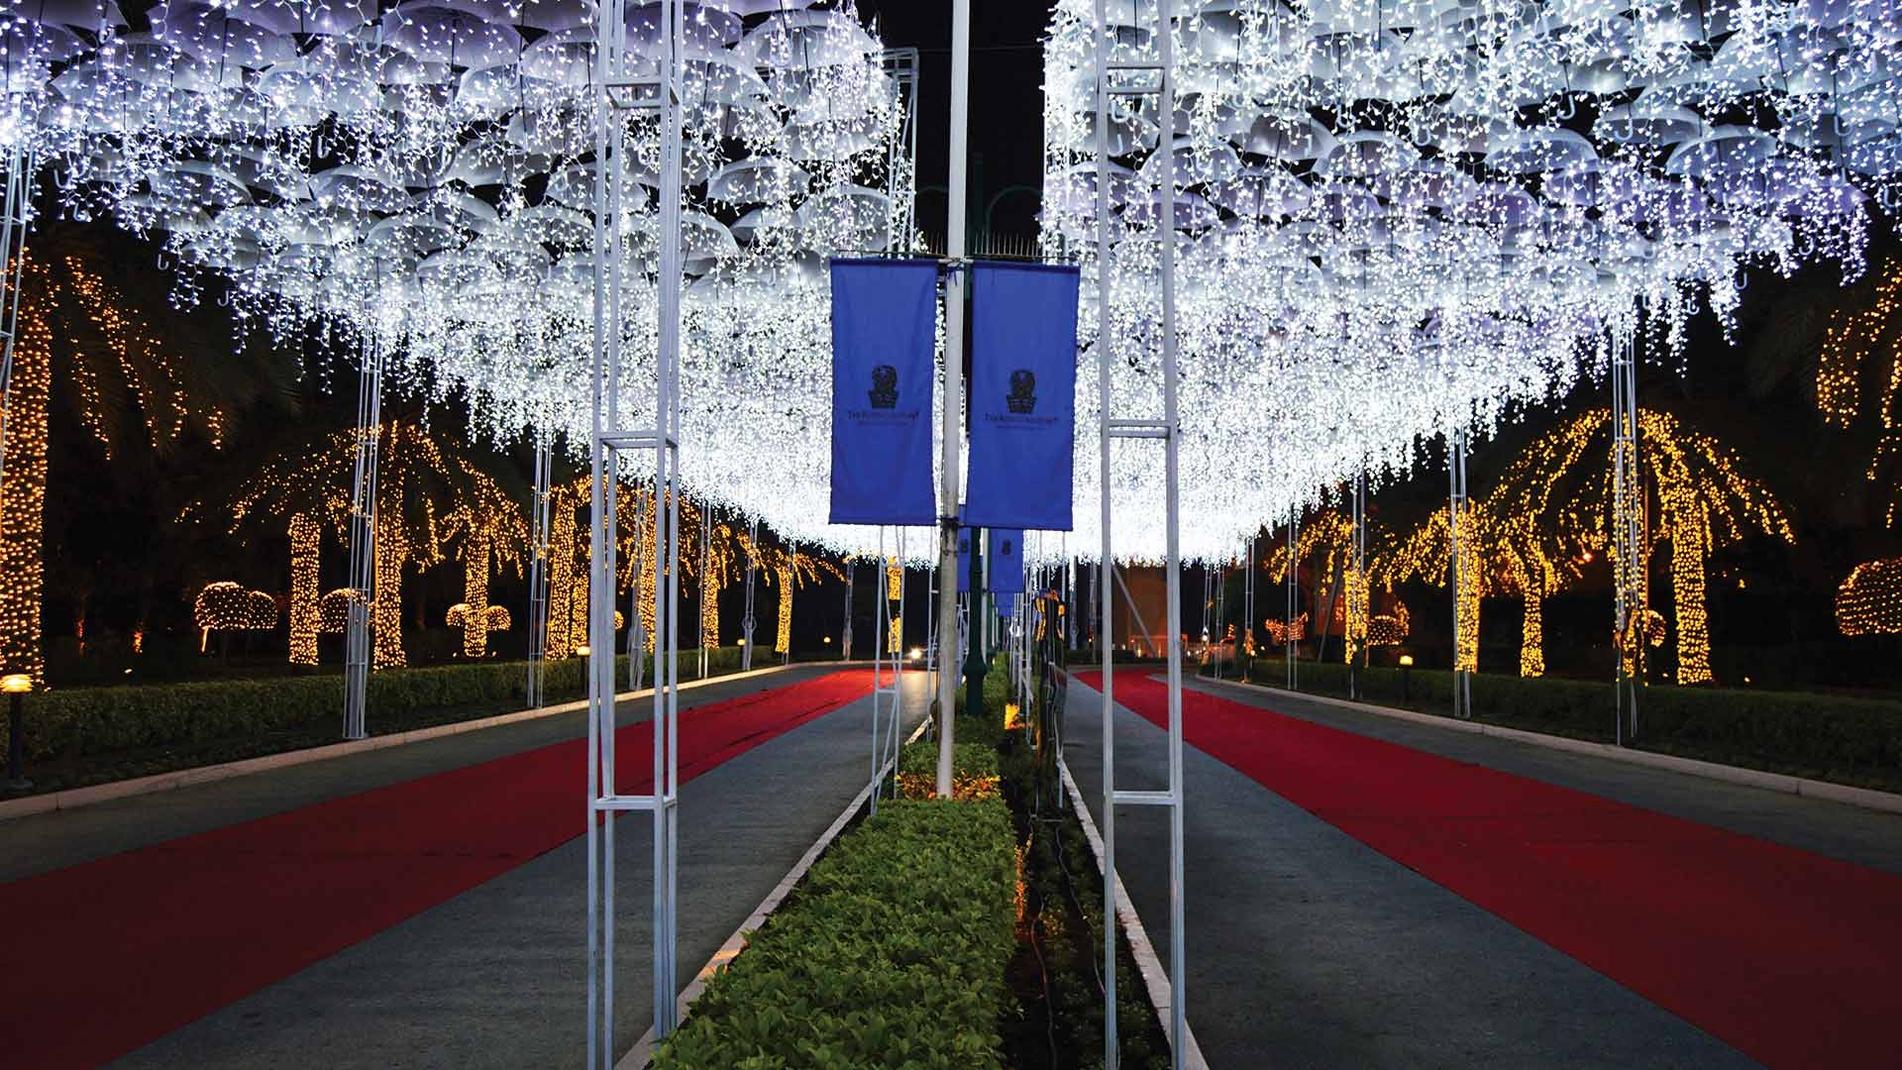 Christmas Umbrella Sky Project  - Manama'15